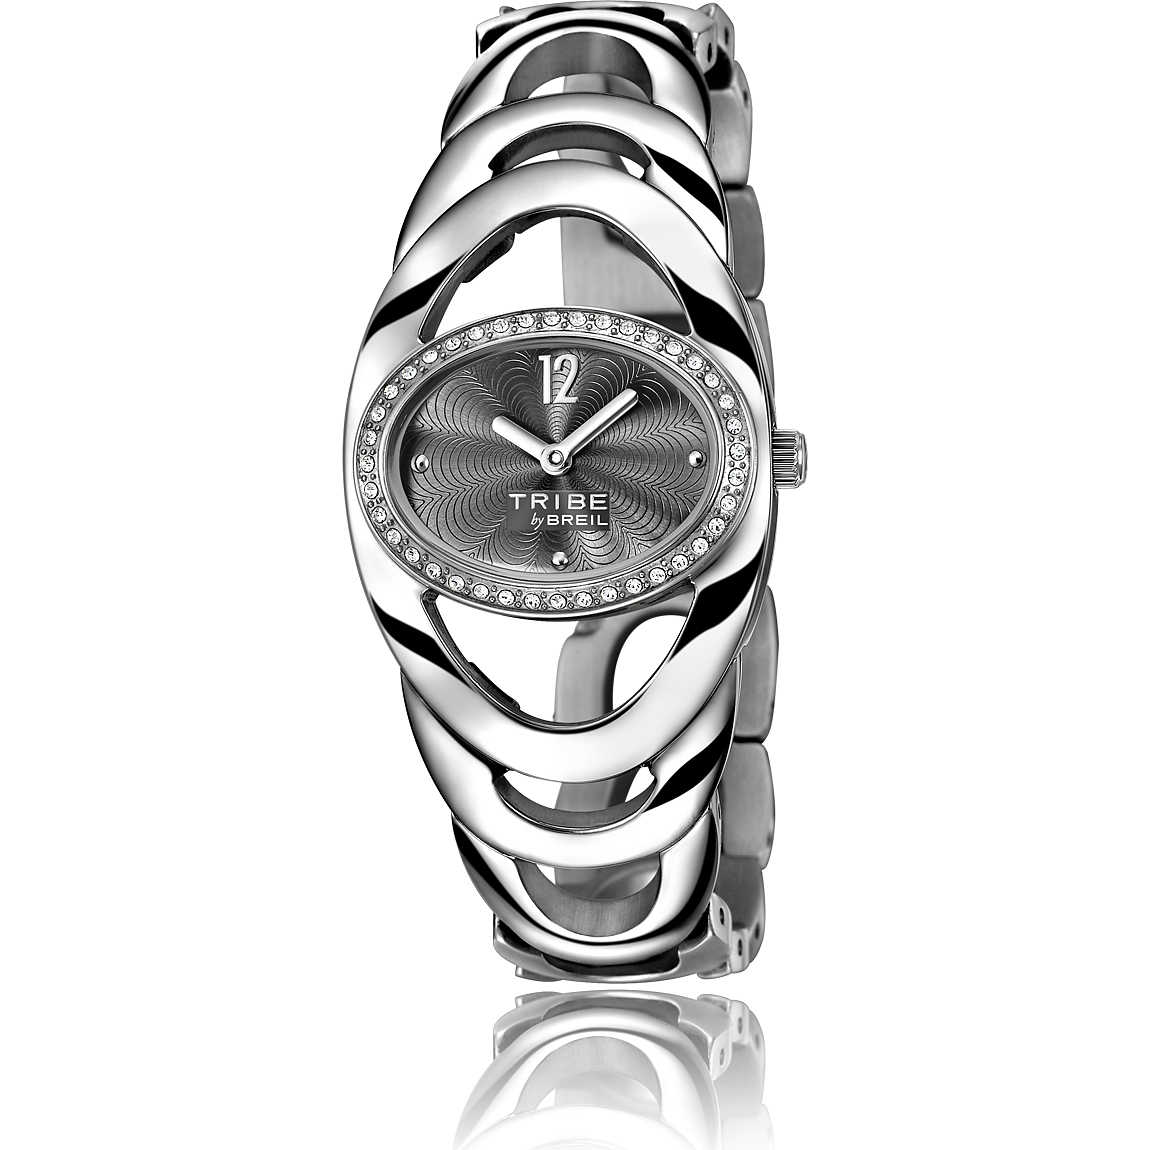 TW0887 orologio Breil solo tempo donna Saturn con swarovski - Orologi Valsusa